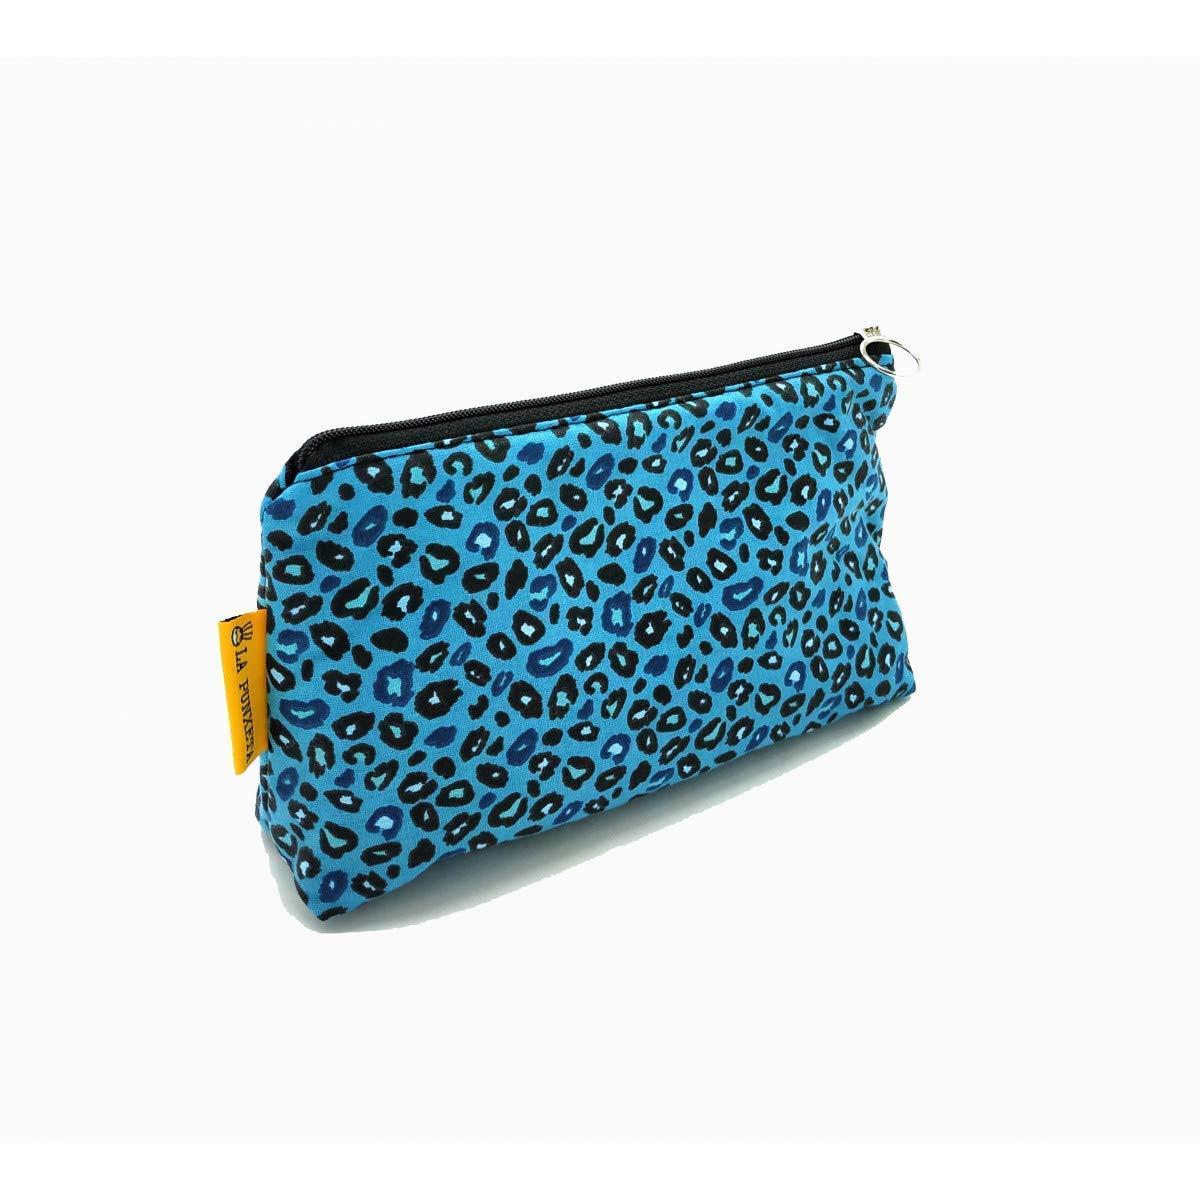 Neceser de tela, Neceser leopardo azul, Estuche de tela animal ...